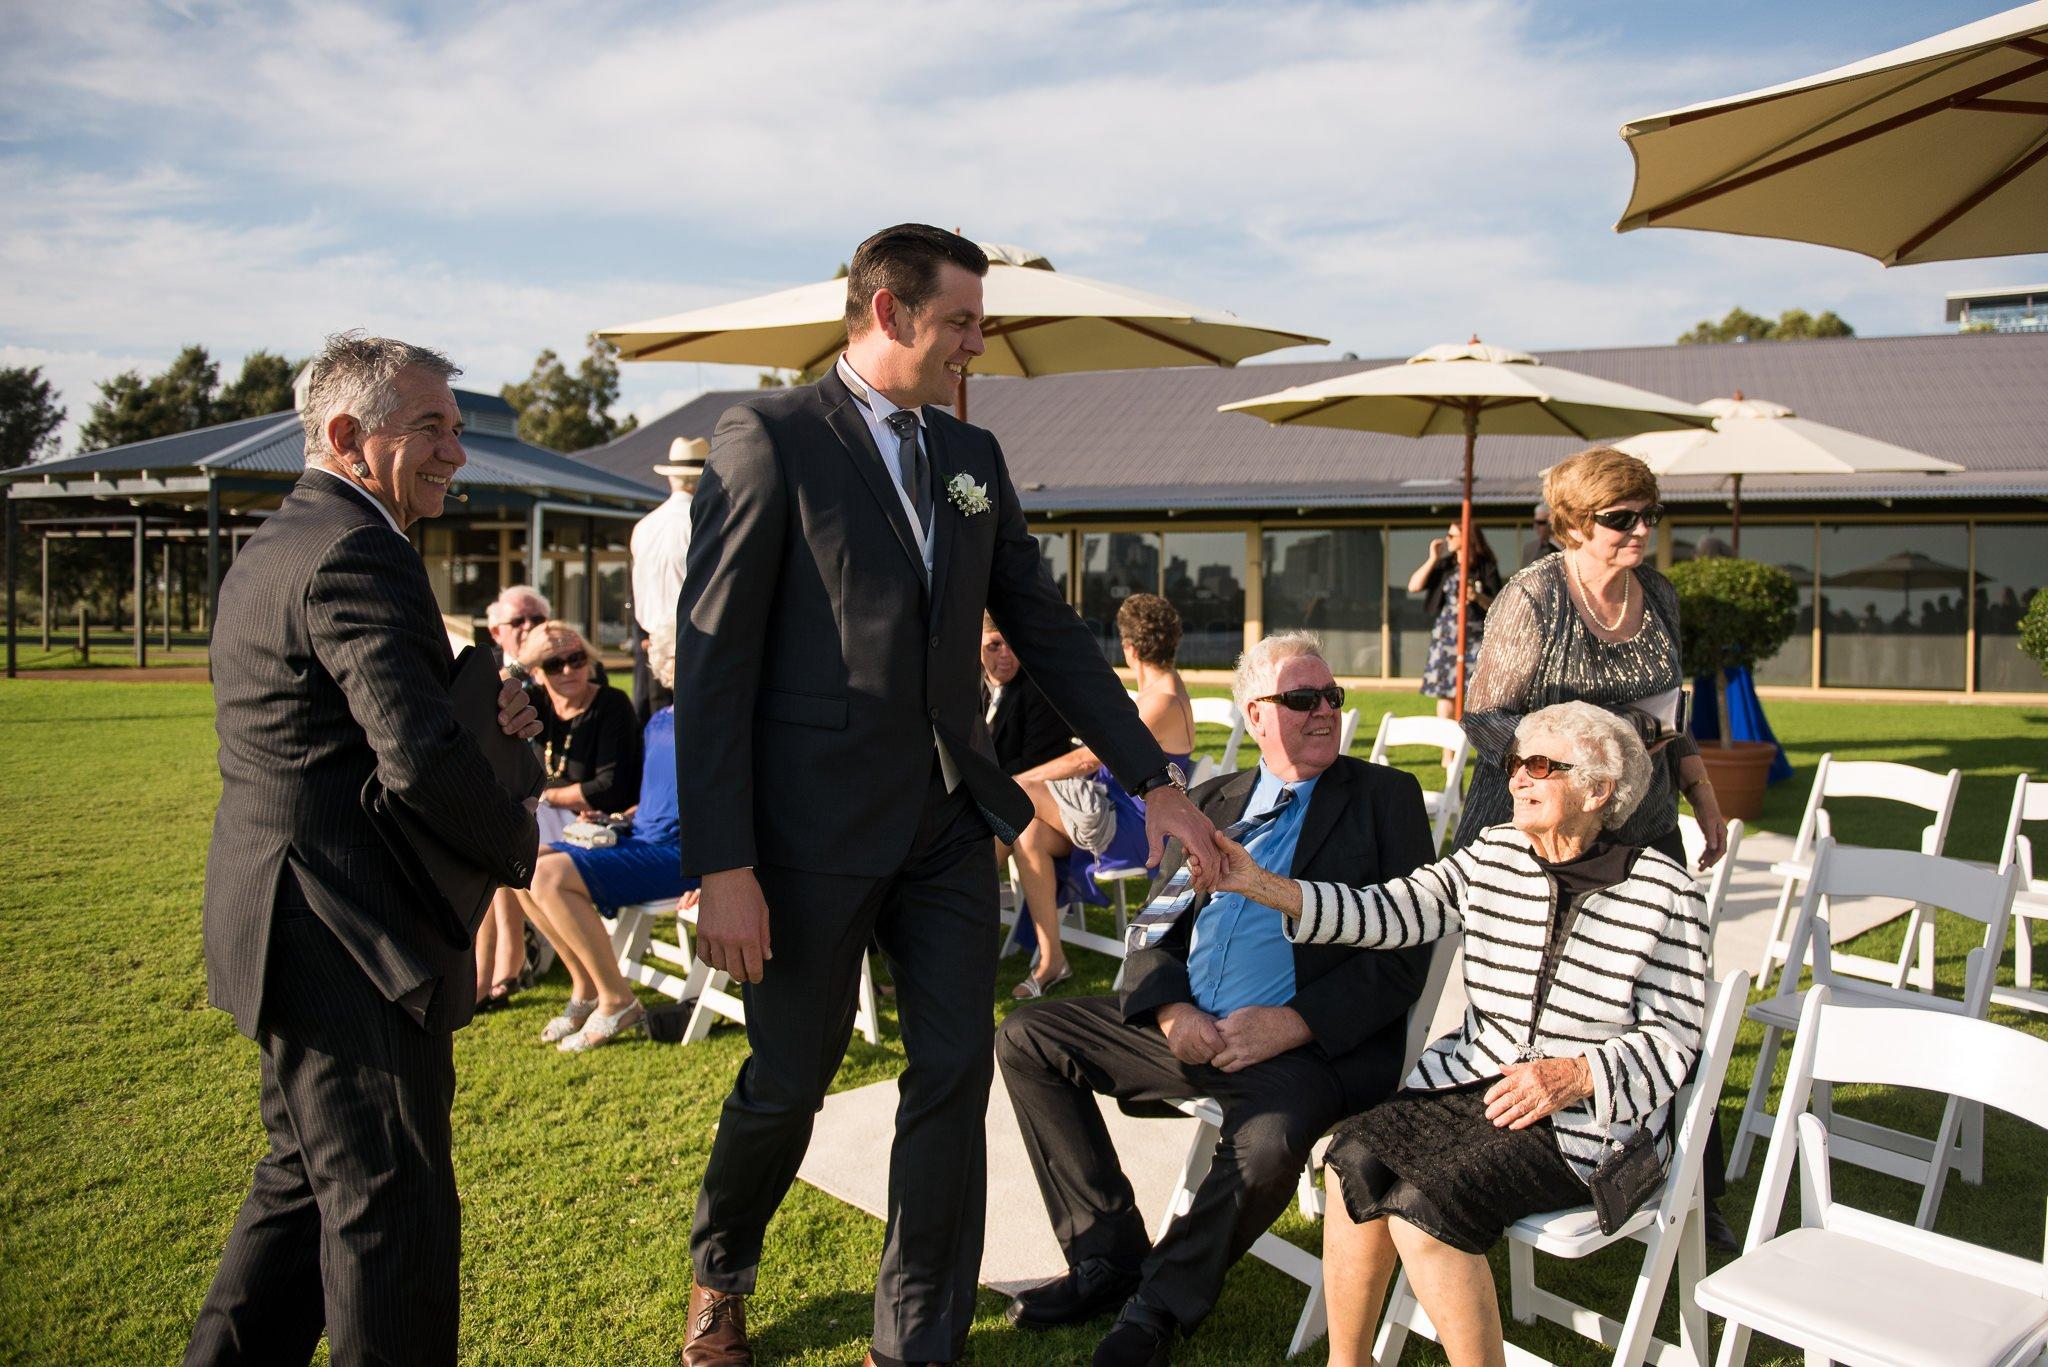 groom with his grandma